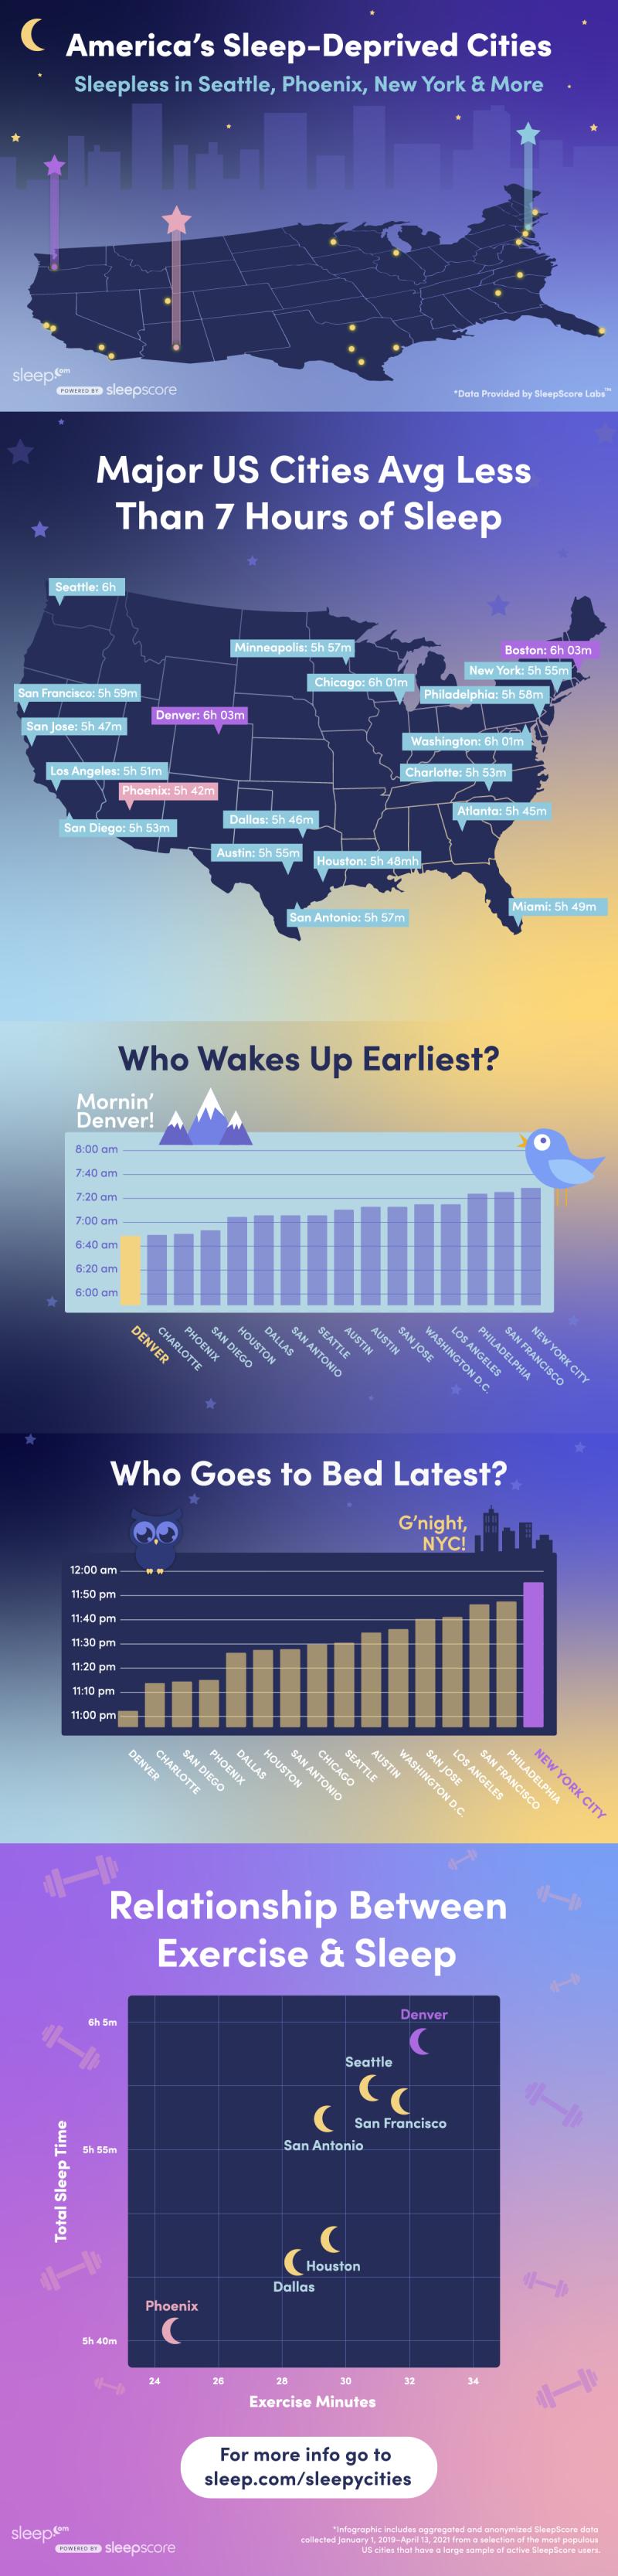 America's Sleep-Deprived Cities